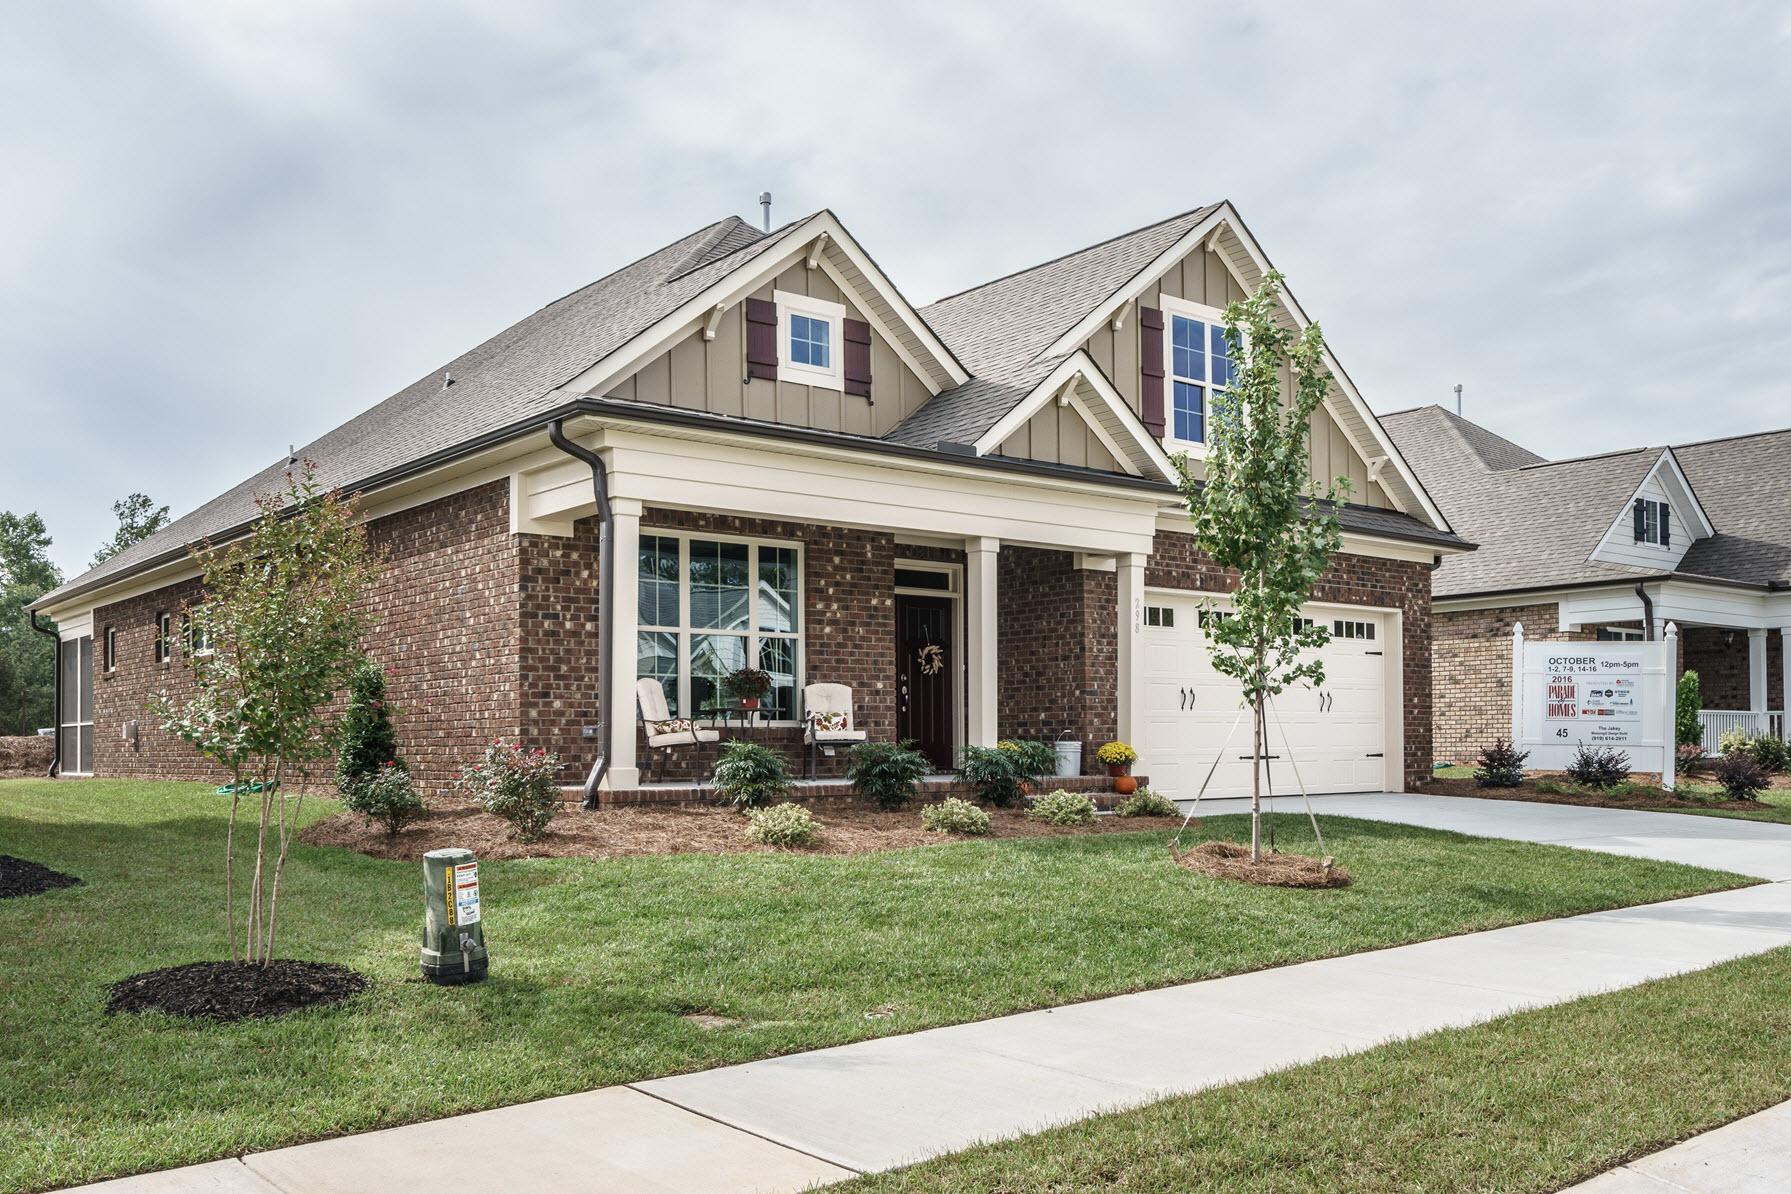 Stunning Home Designers Raleigh Nc Images Interior Design Ideas